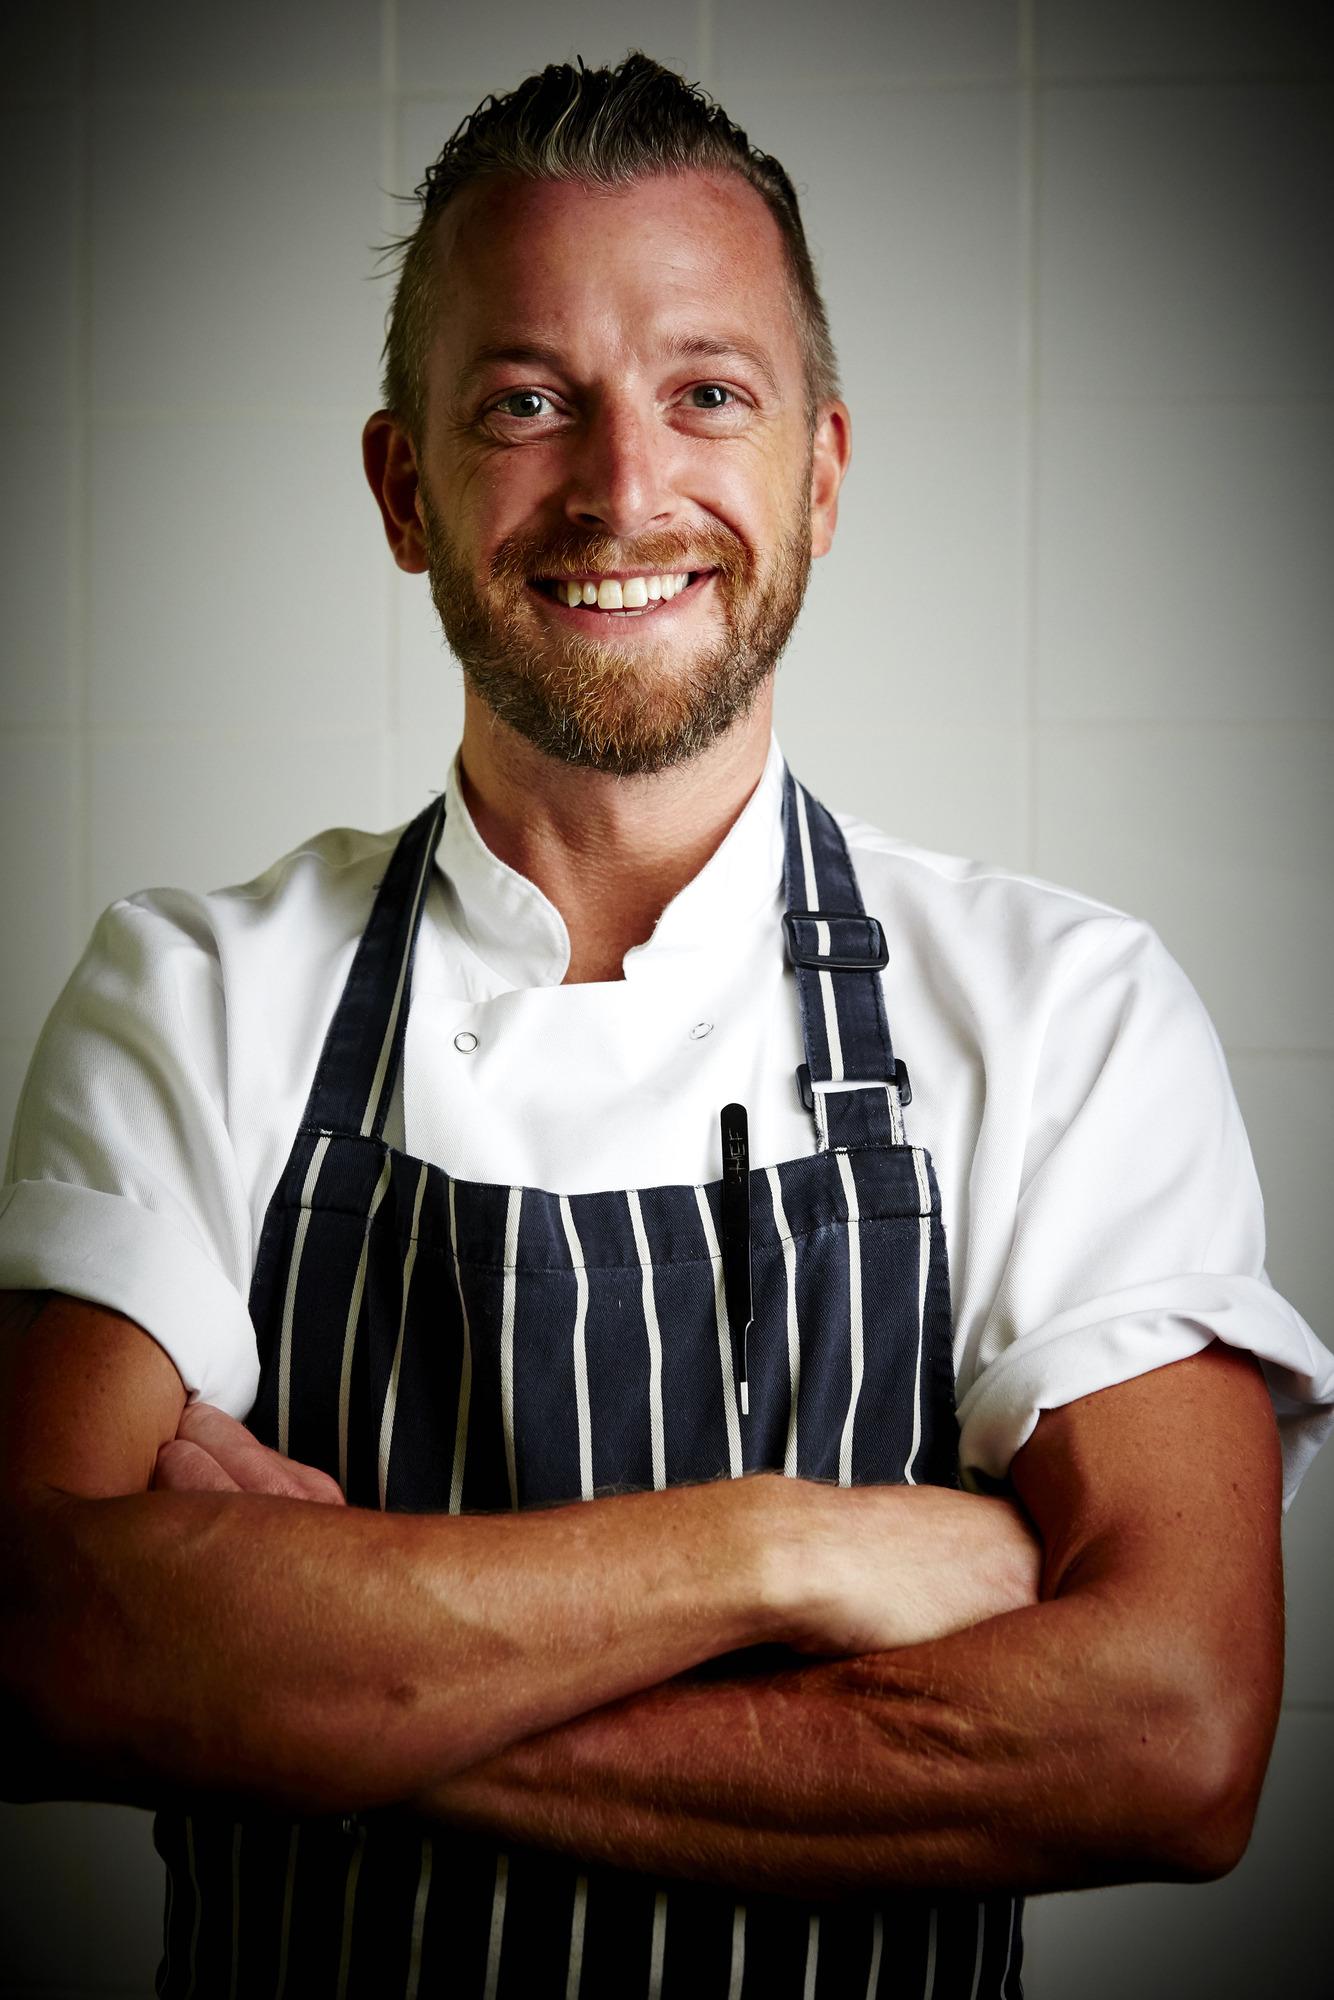 Nick Brodie, head chef, Llangoed Hall, Great British Menu 2017